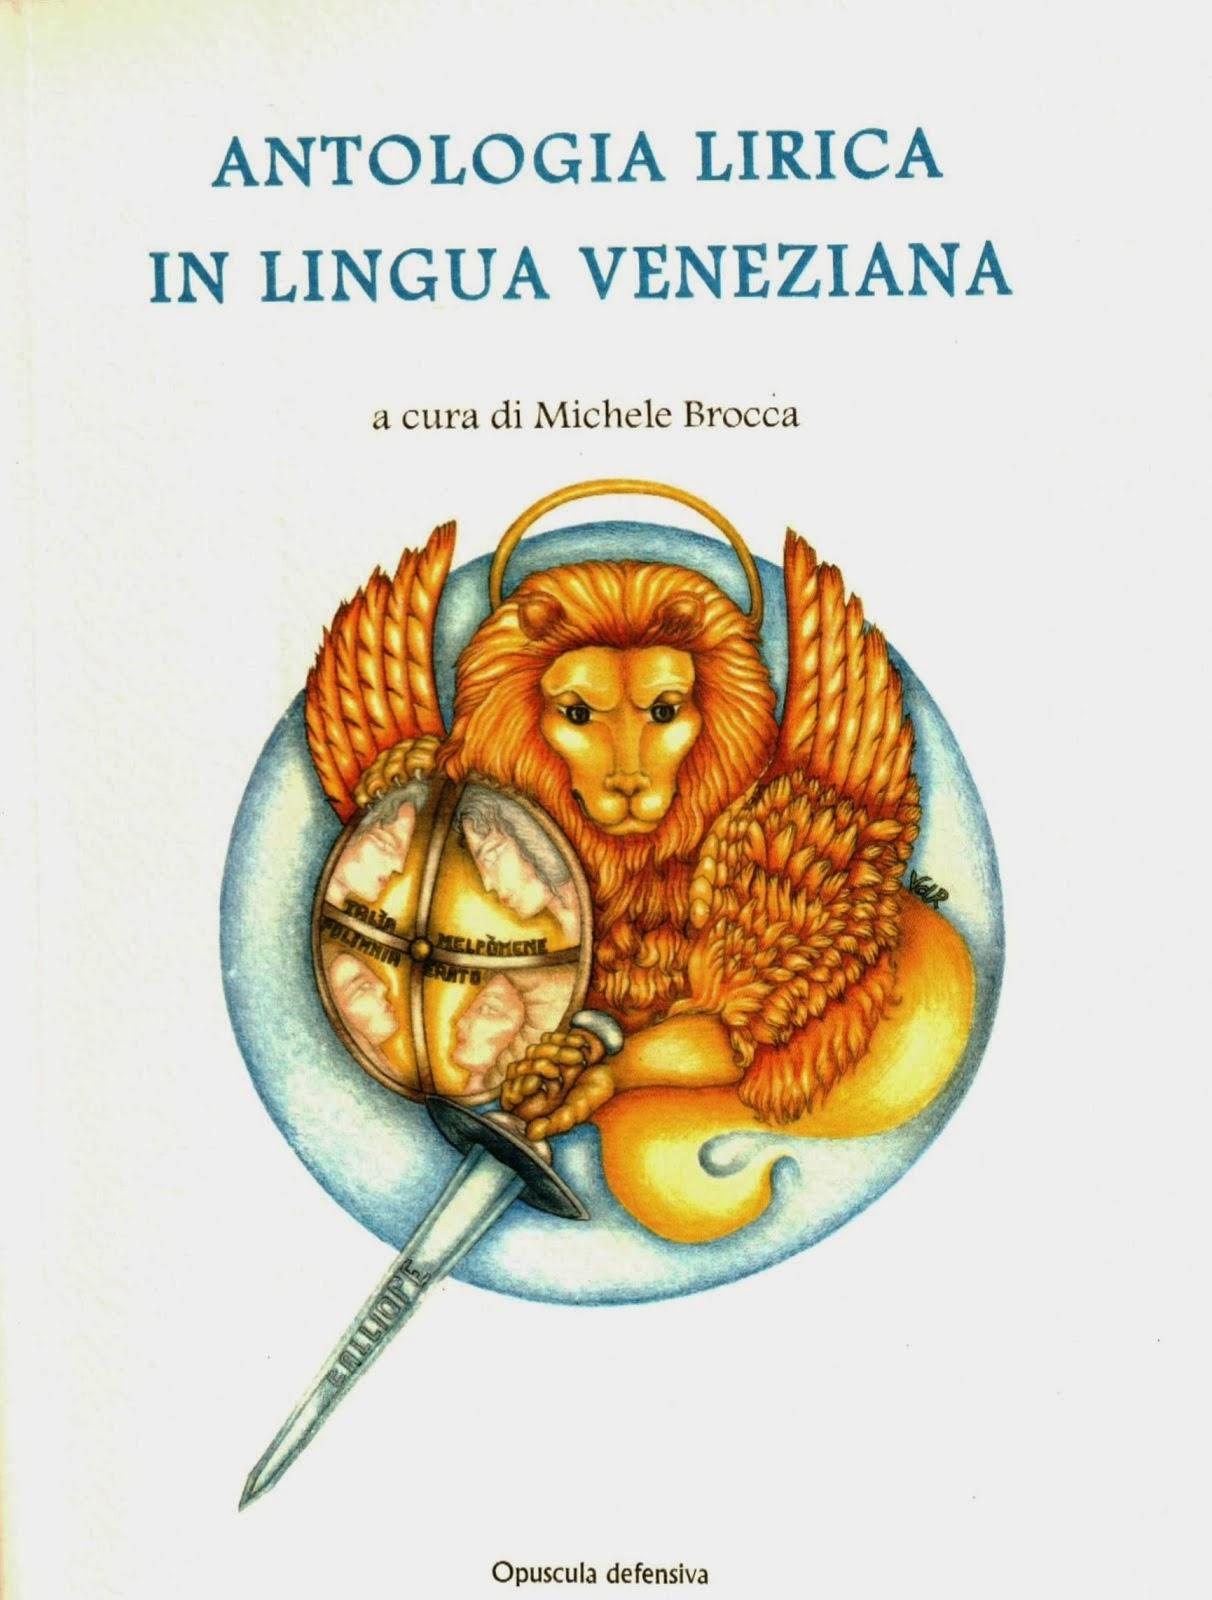 ANTOLOGIA LIRICA IN LINGUA VENEZIANA